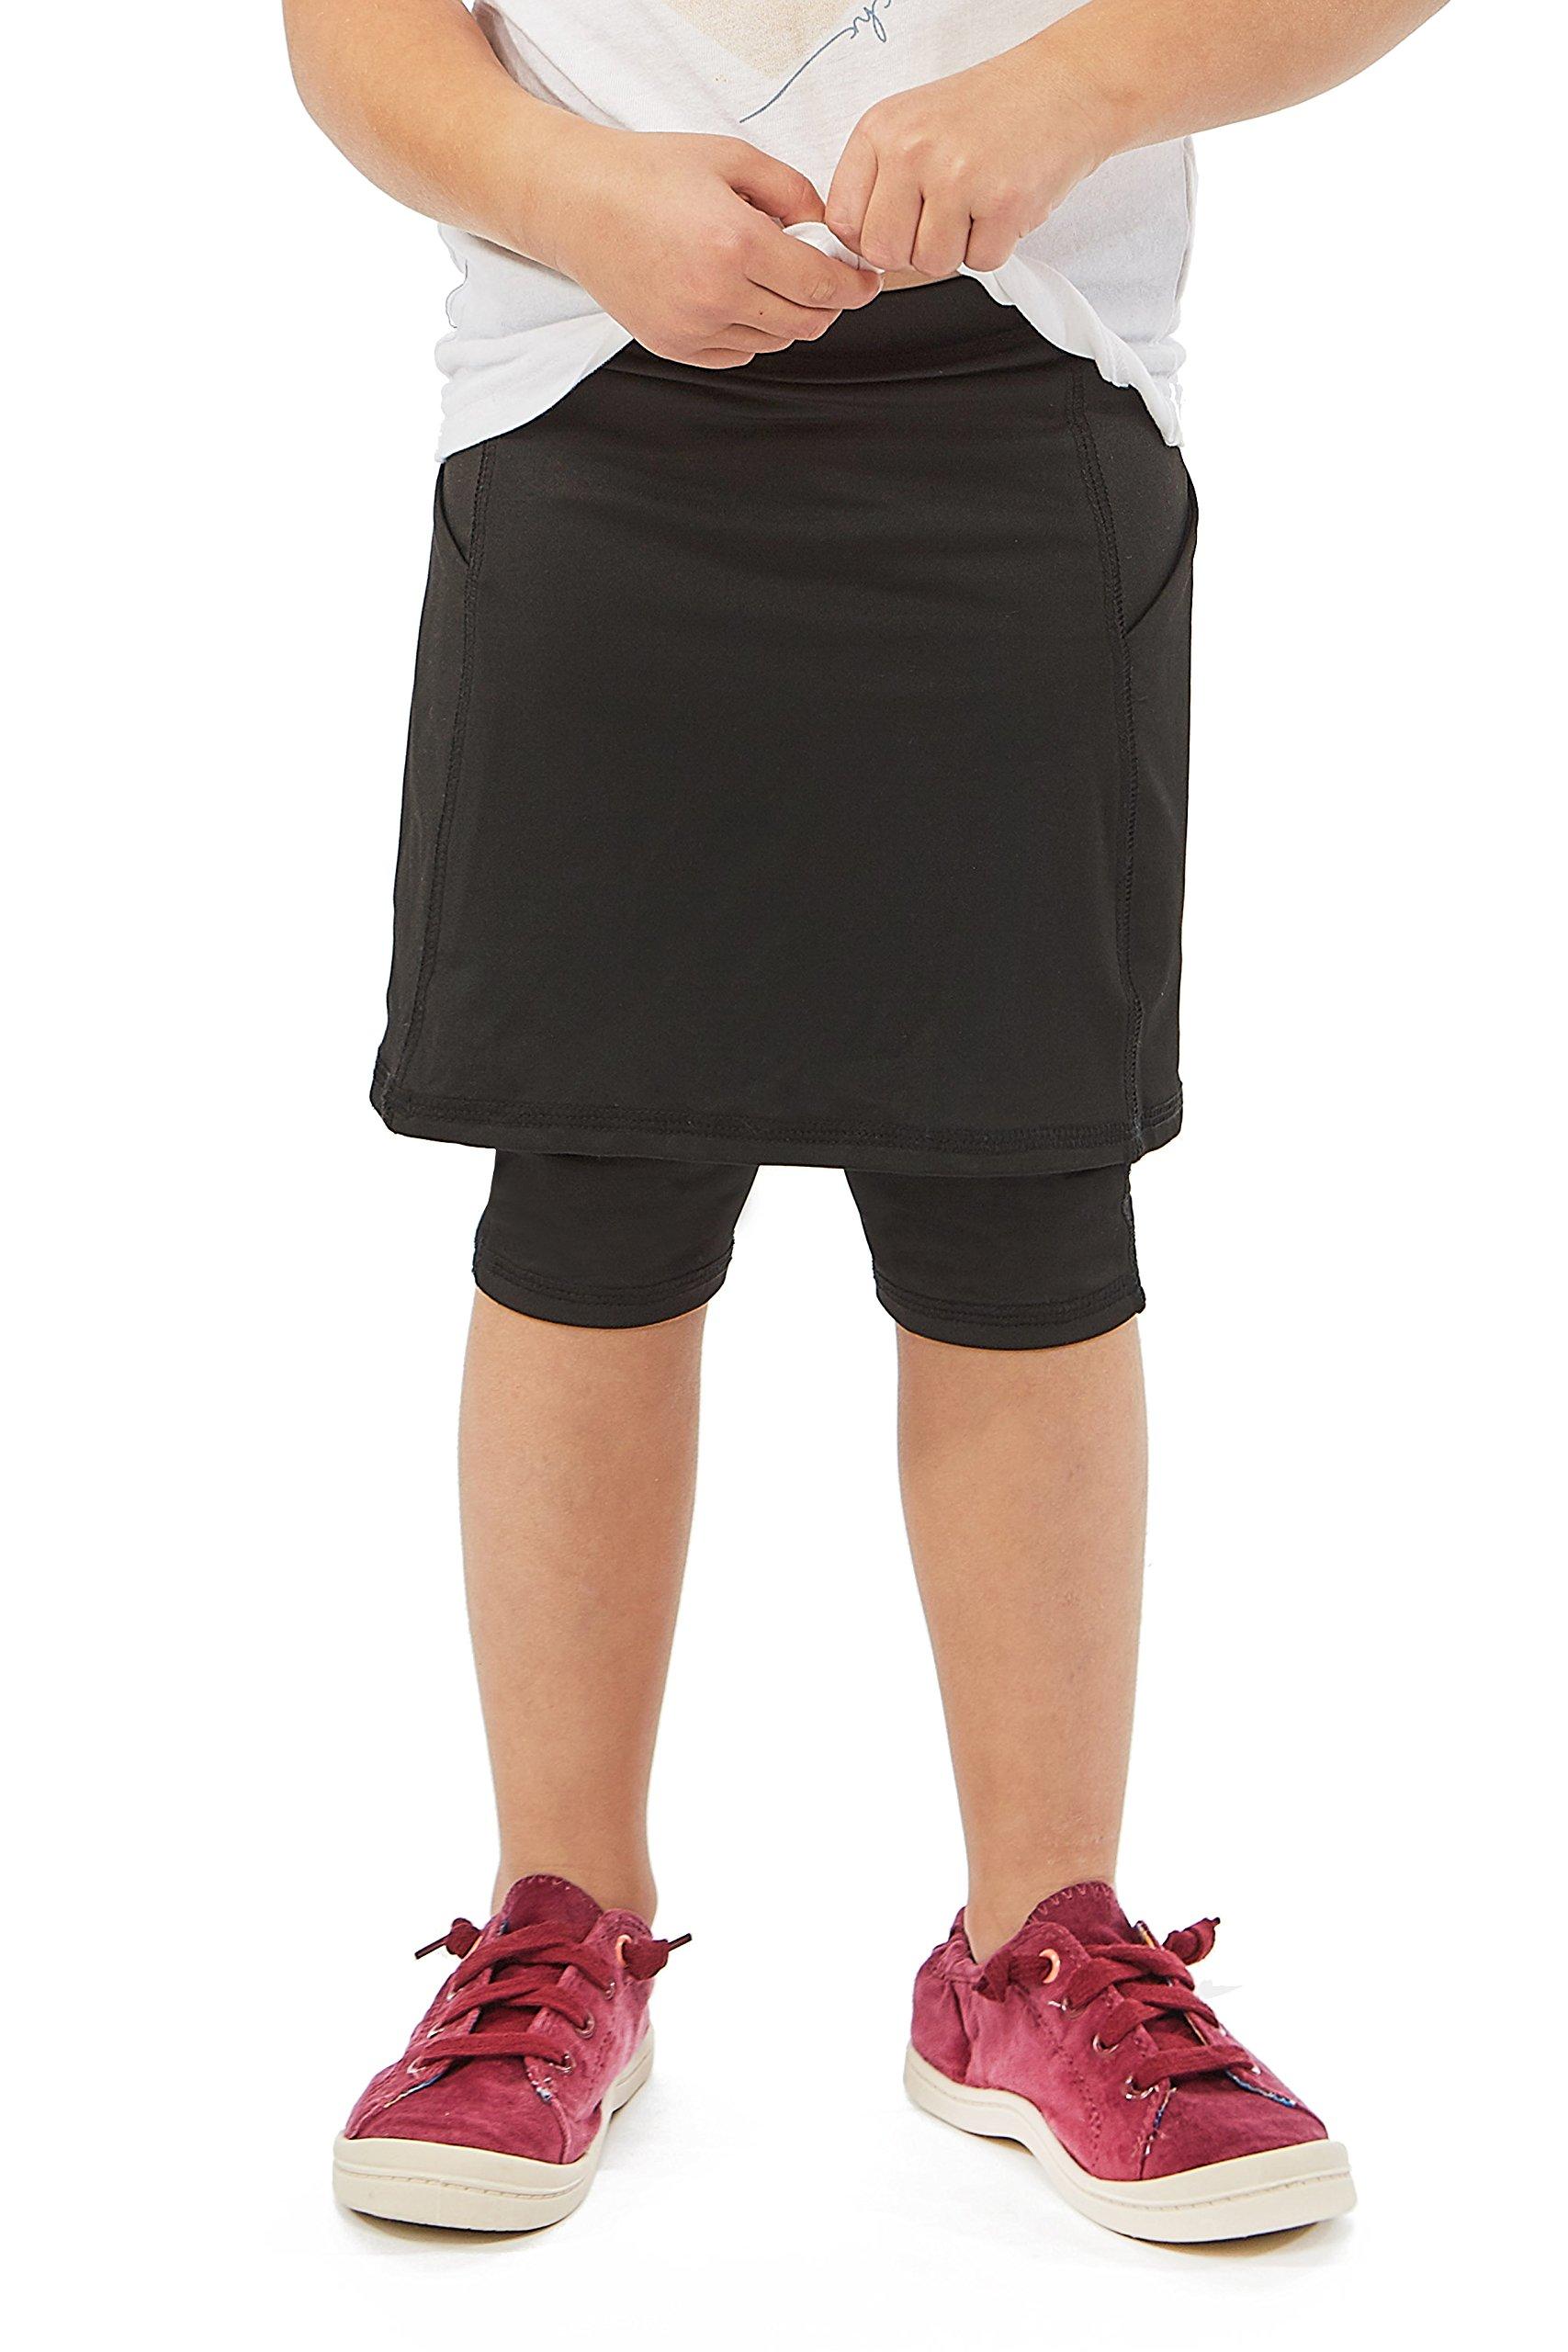 Kids Fit Snoga Active Skirt with Capri Leggings in Black - Girls 12 by Snoga Athletics